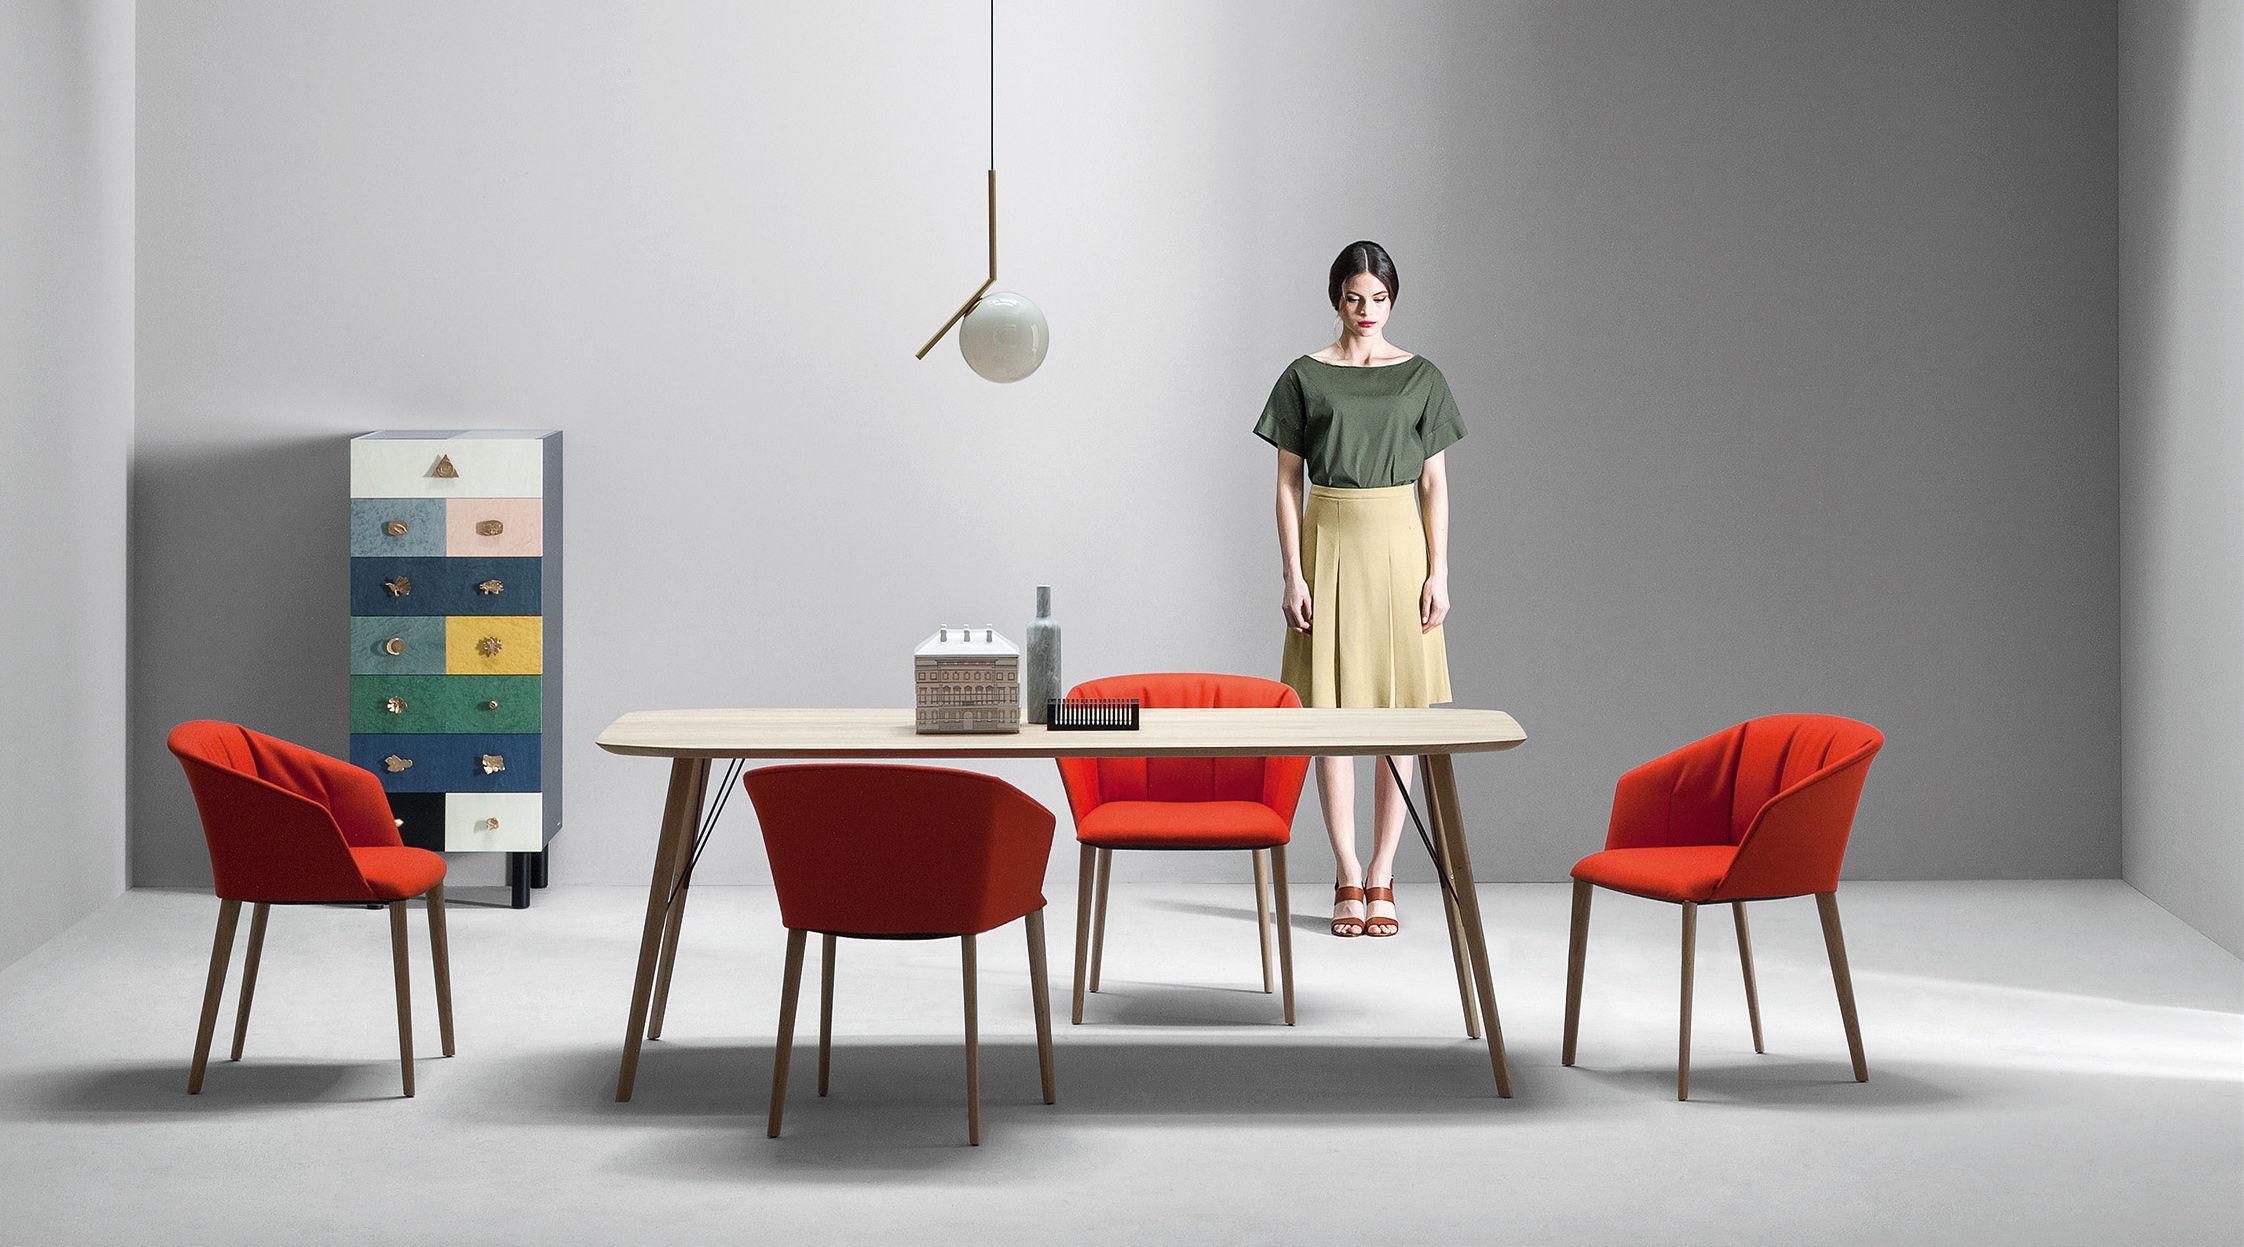 liza stoff stuhlbeine aus holz zanotta gepolsterter sessel. Black Bedroom Furniture Sets. Home Design Ideas